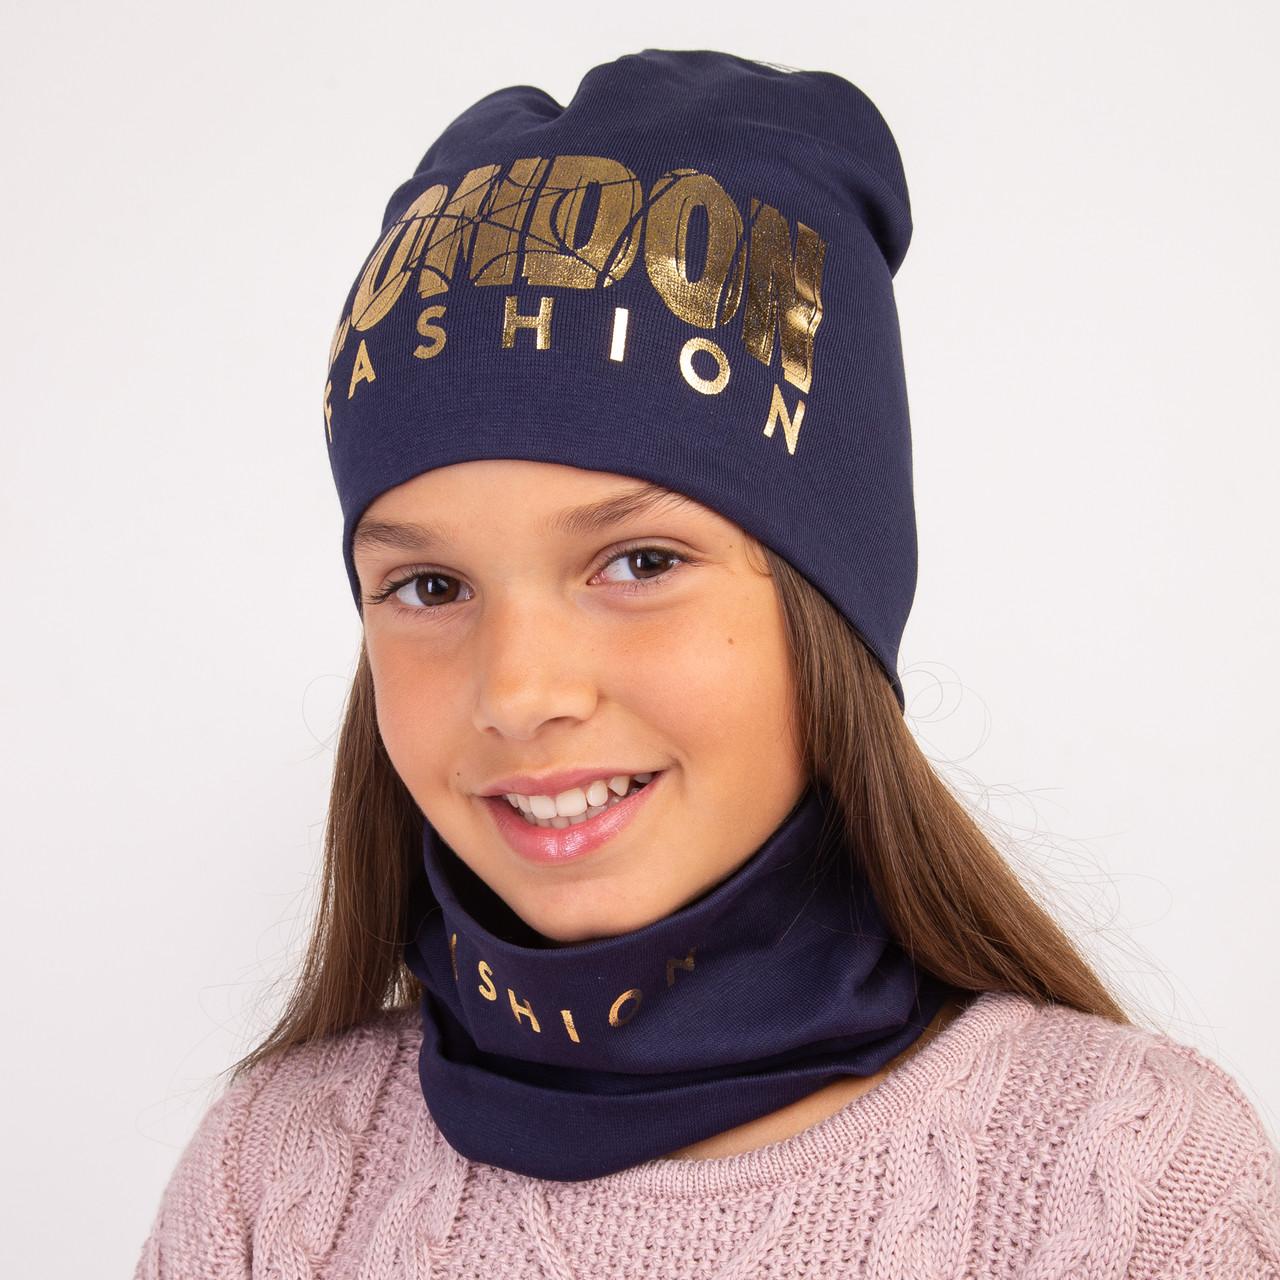 Модный комплект на весну для девочки - LONDON - Артикул 2296